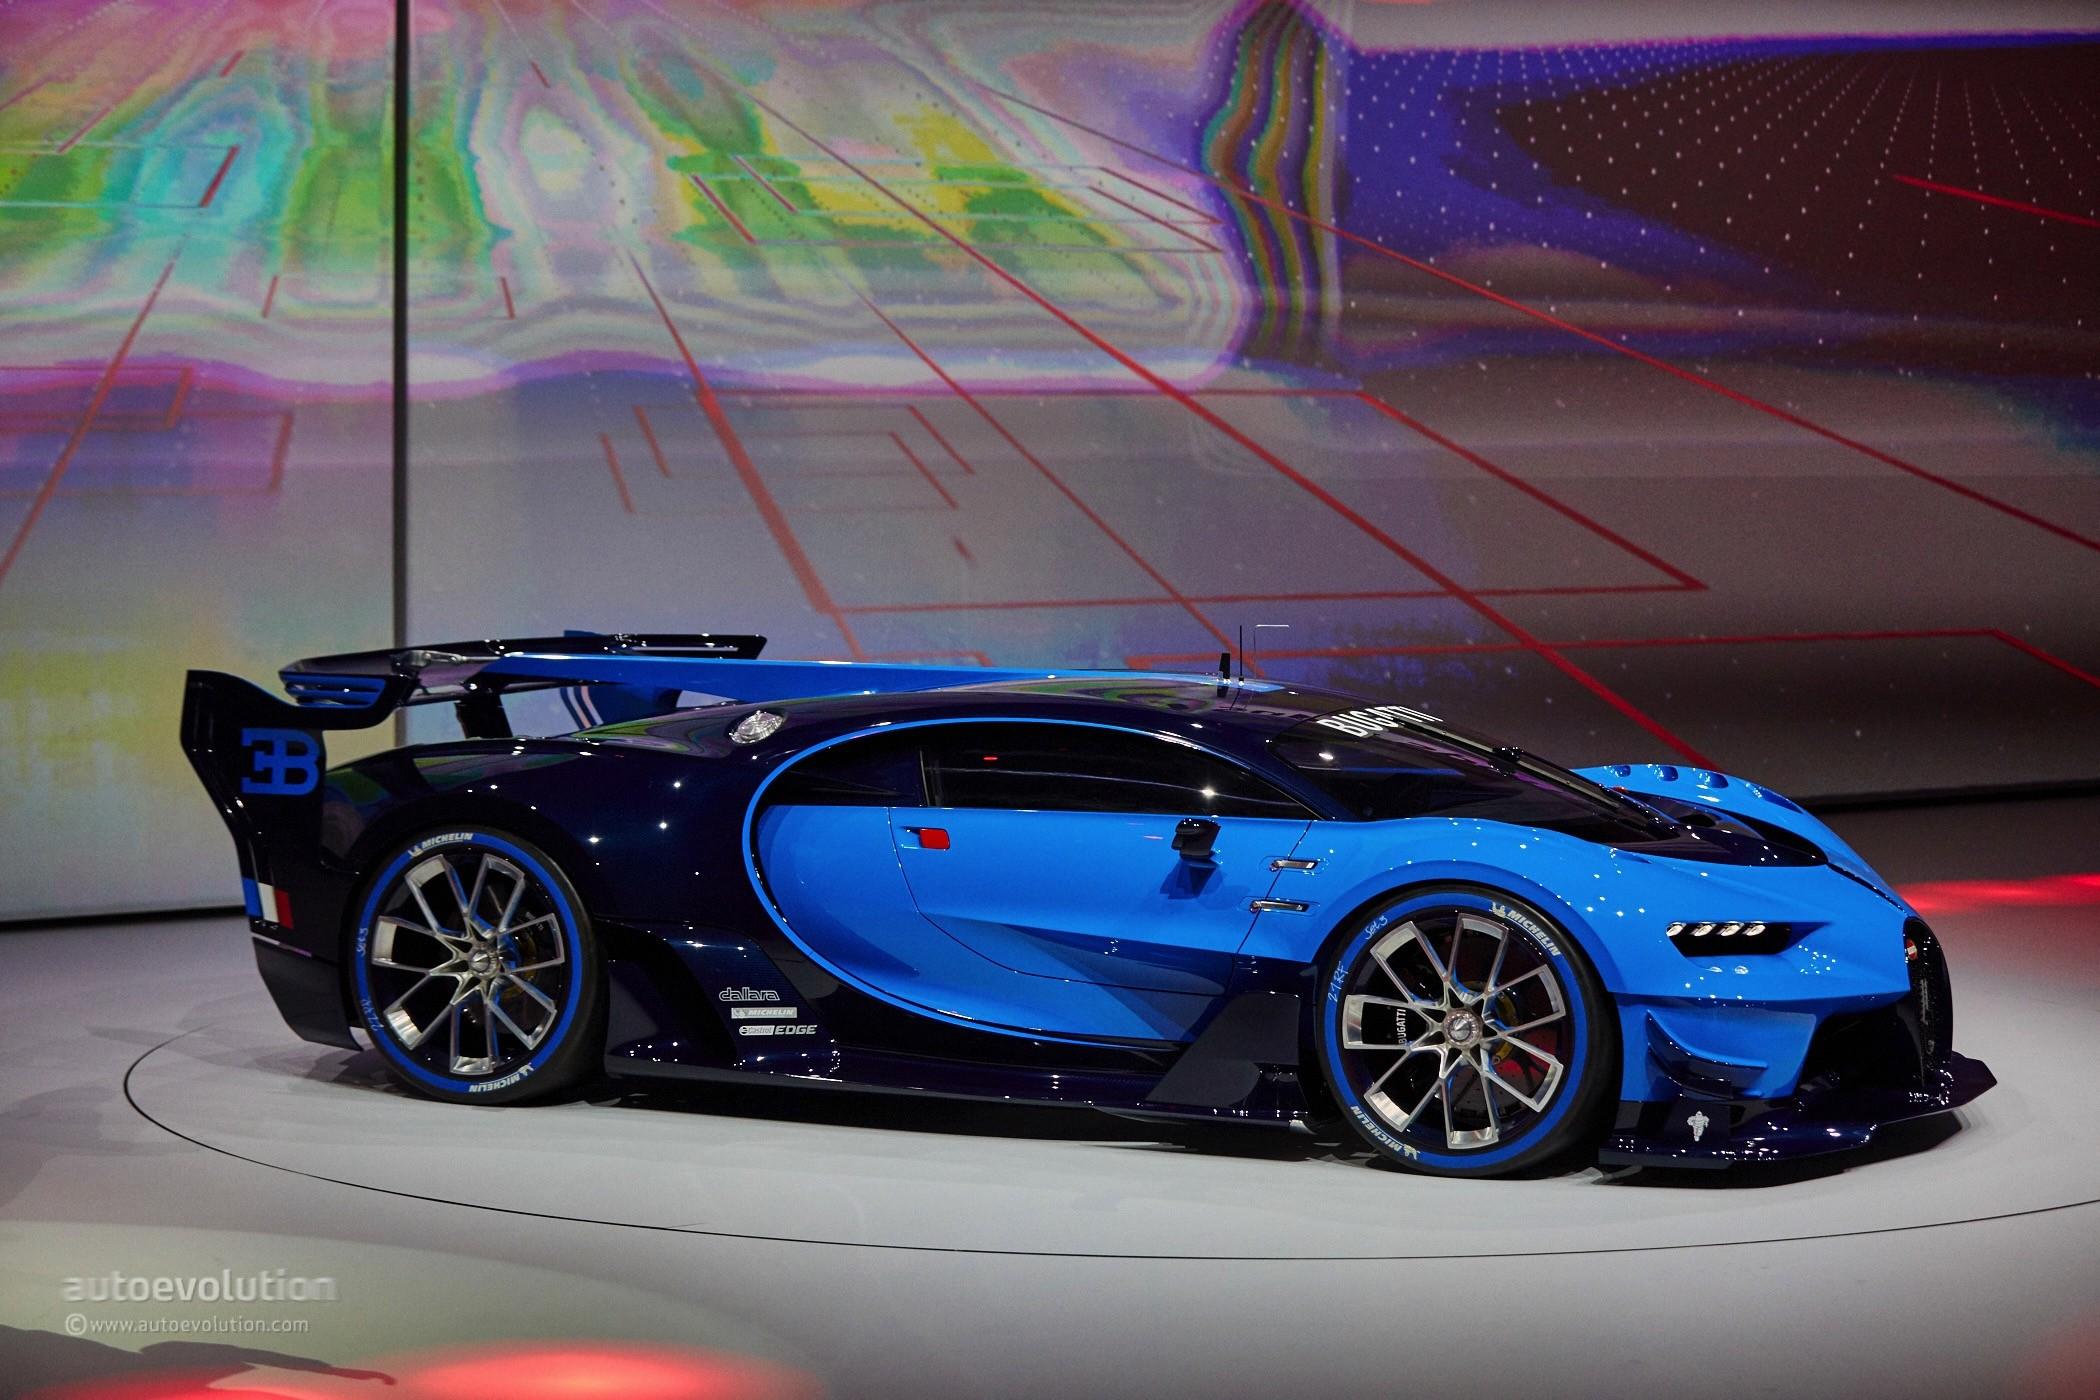 bugatti-chiron-getting-targa-version-in-2018-102334_1